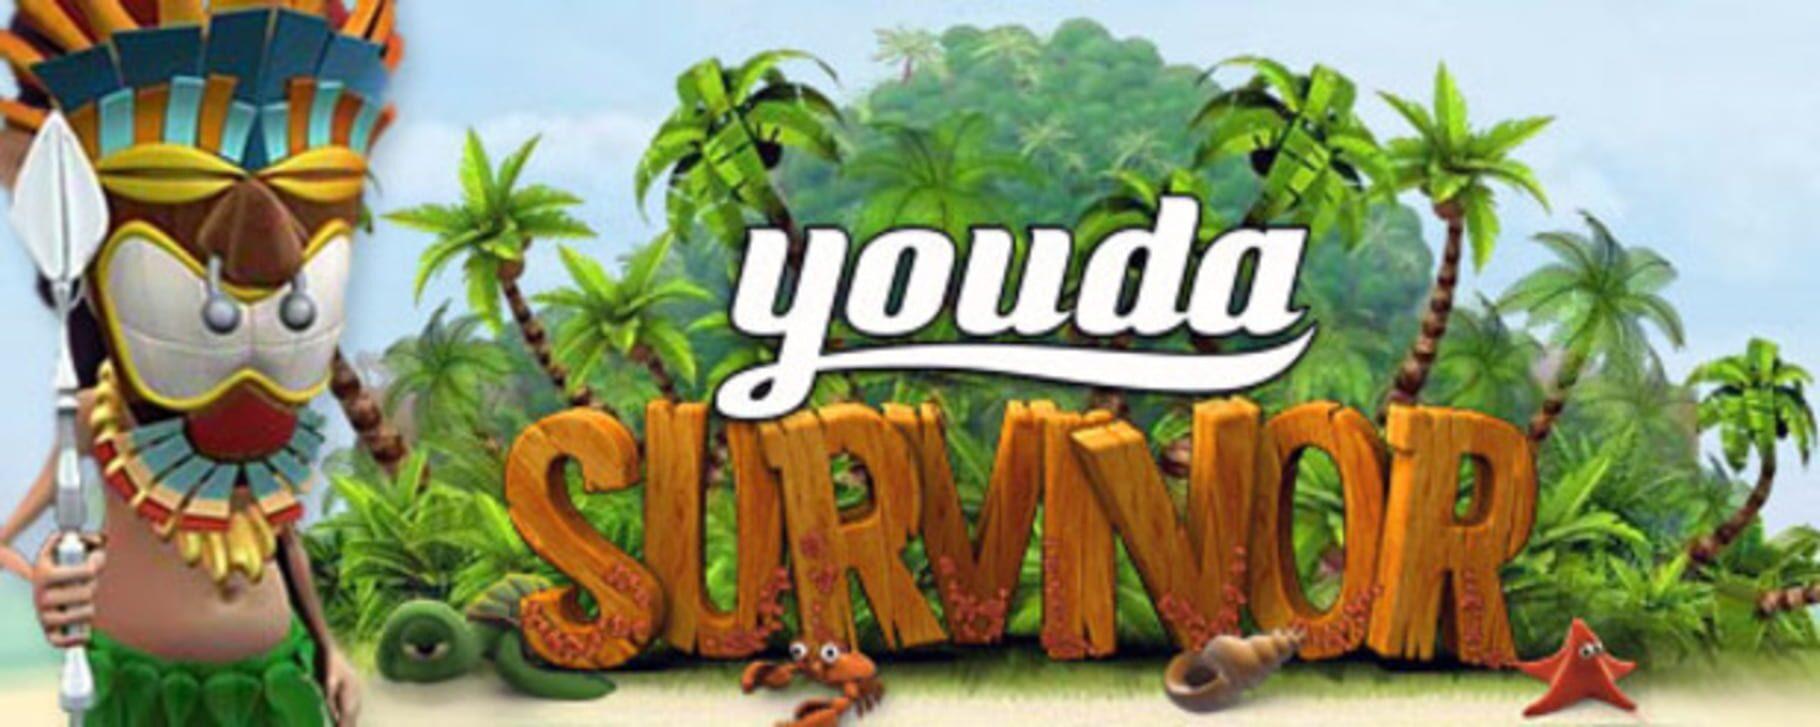 buy Youda Survivor cd key for all platform